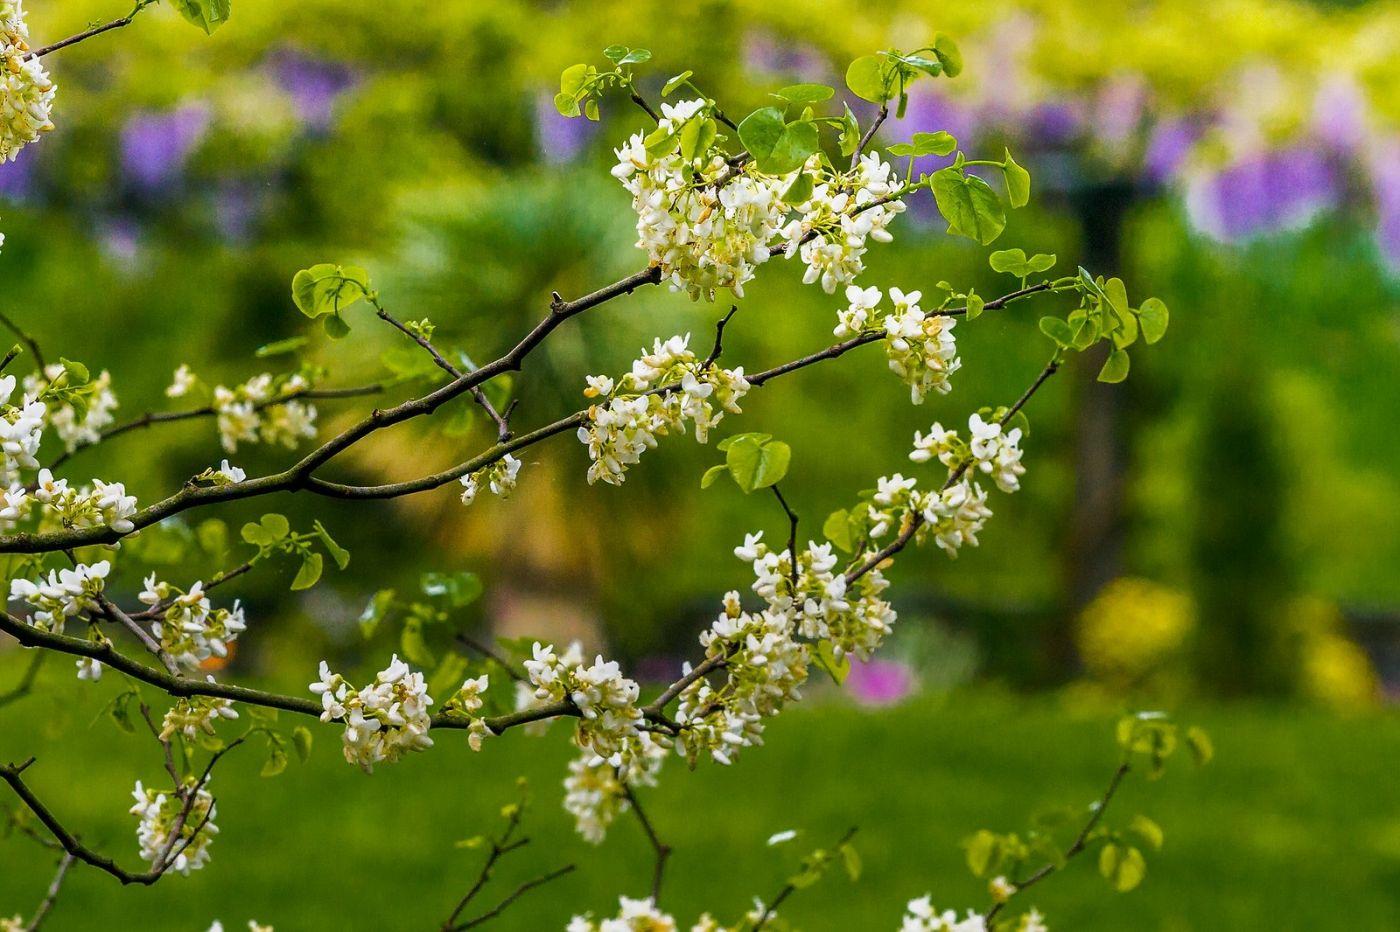 Chanticleer花园,有梦想的季节_图1-16